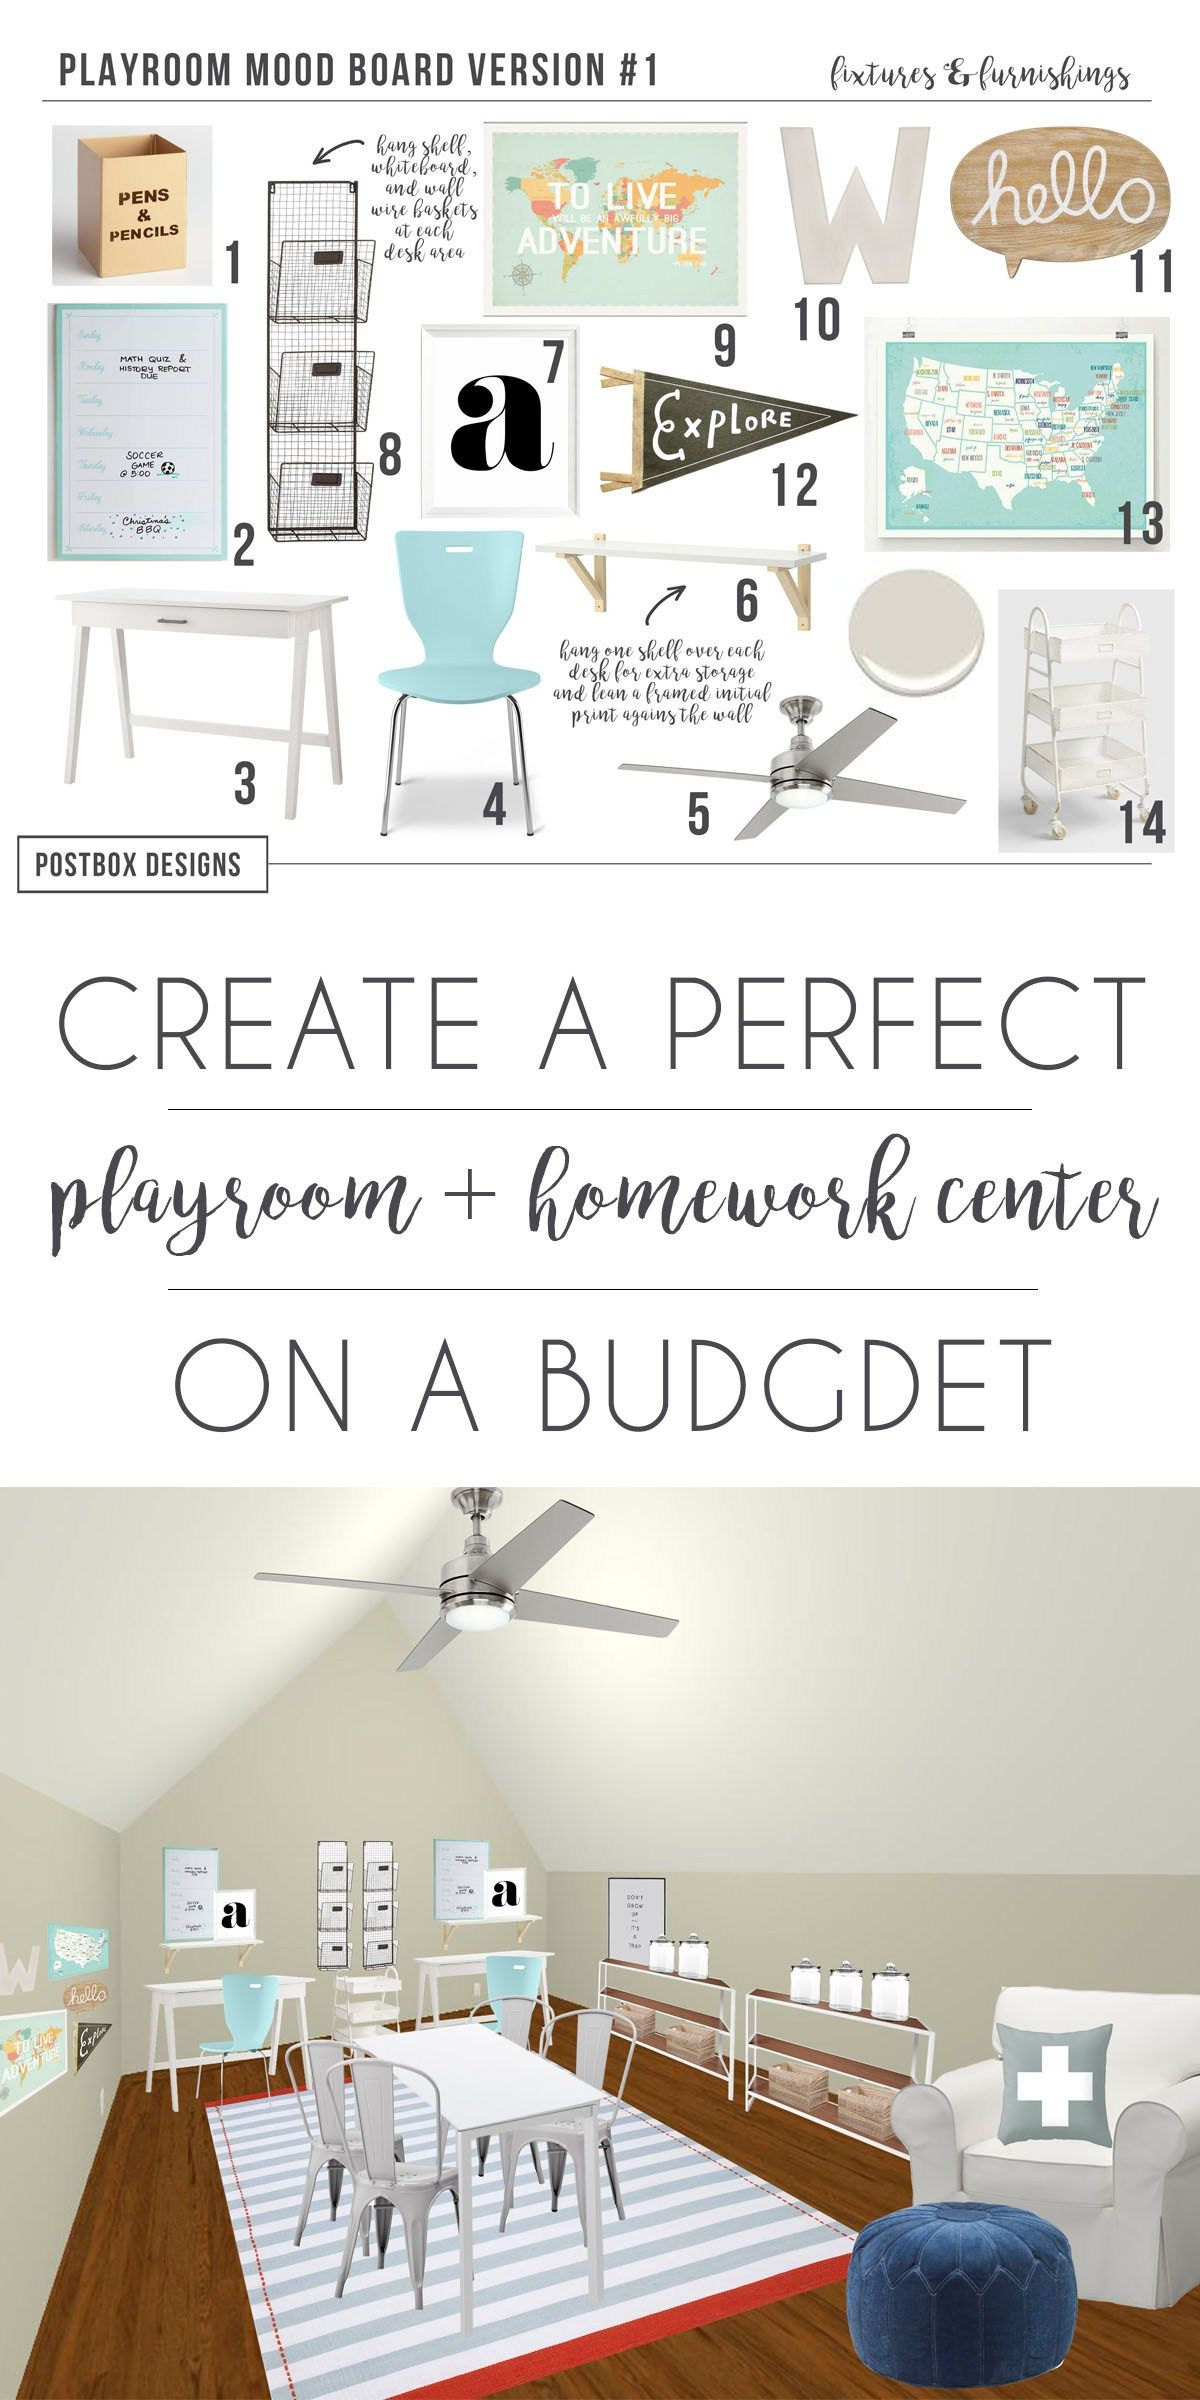 Postbox designs interior  design kid   playroom homework station decor ideas online also transforming  home with an plan rh br pinterest